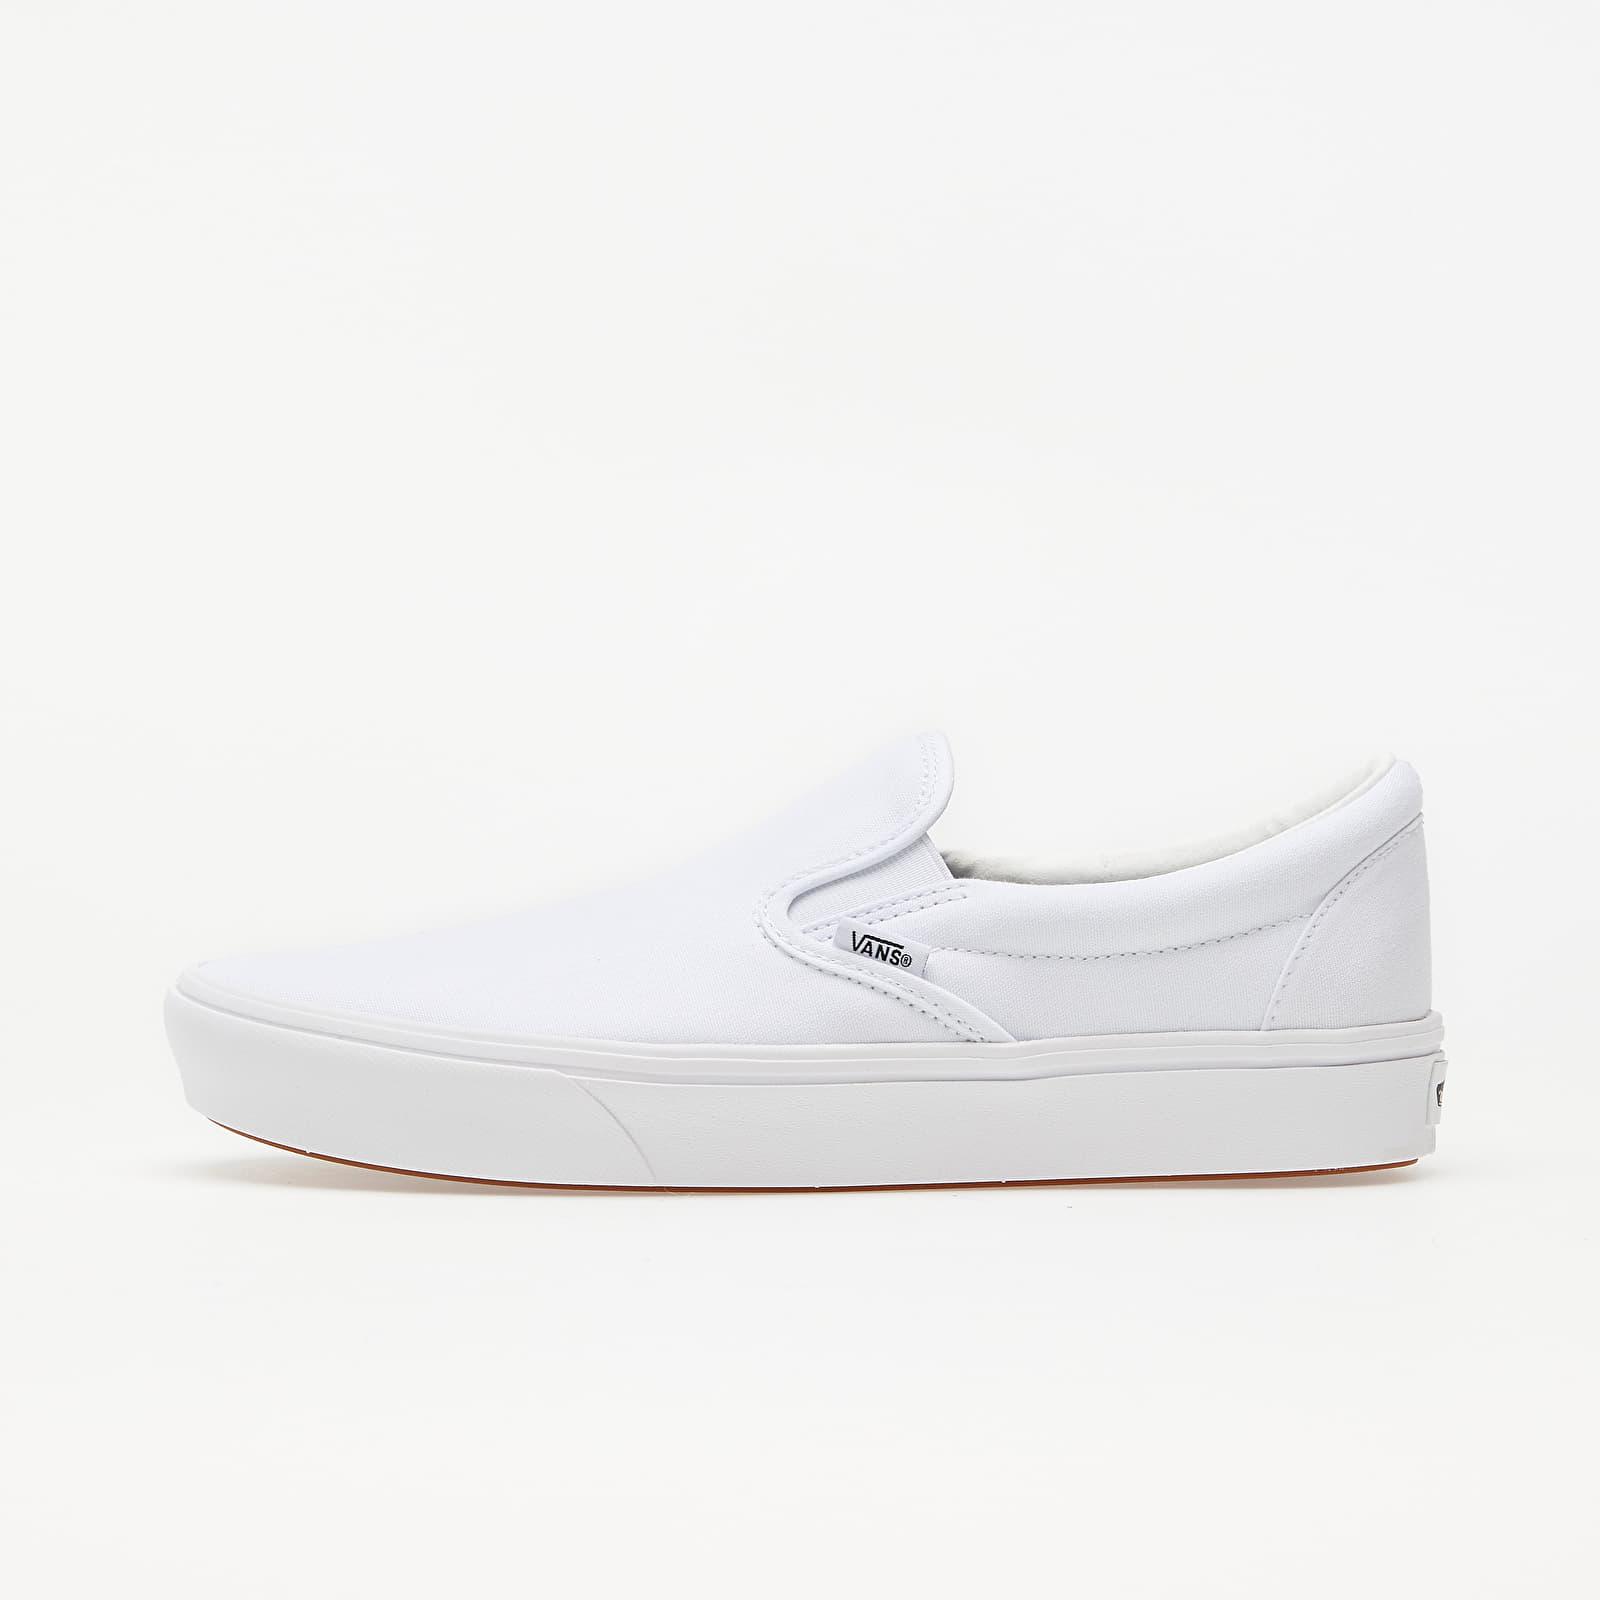 Men's shoes Vans ComfyCush Slip-On (Classic) True White/ True